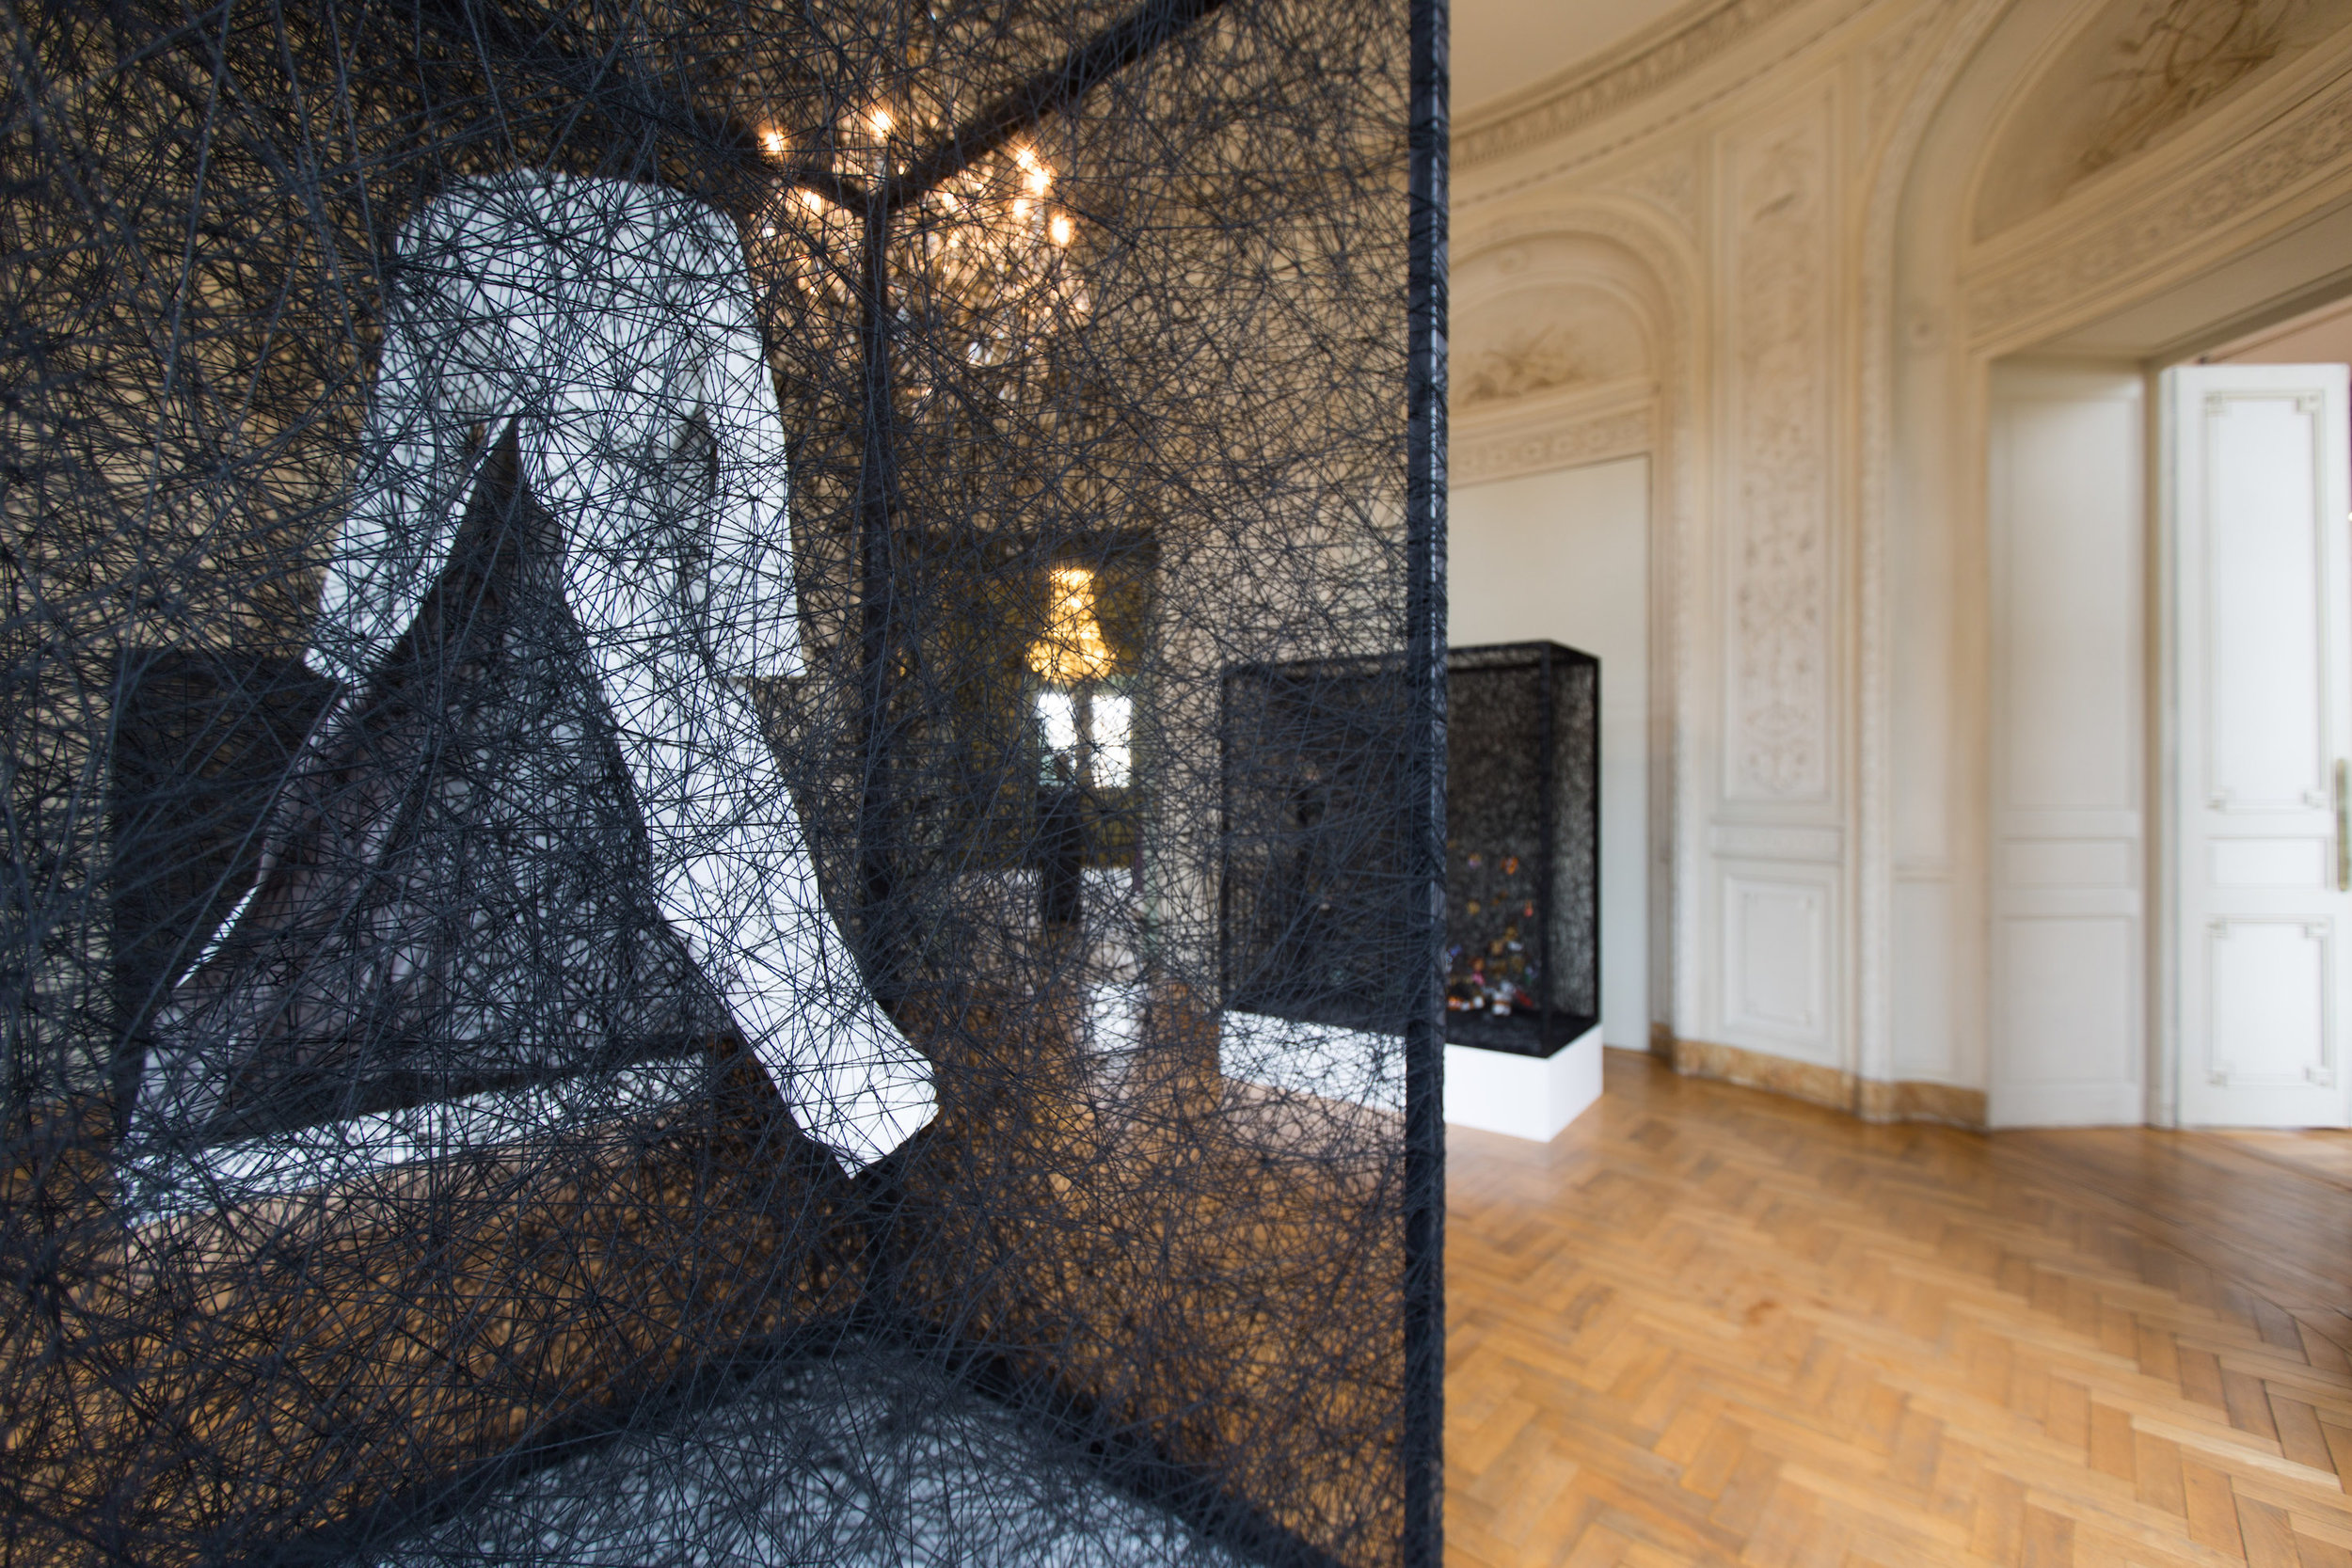 2017_Exposition Daniel Templon_Institut Culturel Bernard Magrez_Photo Constant Formé Bècherat_03.jpg